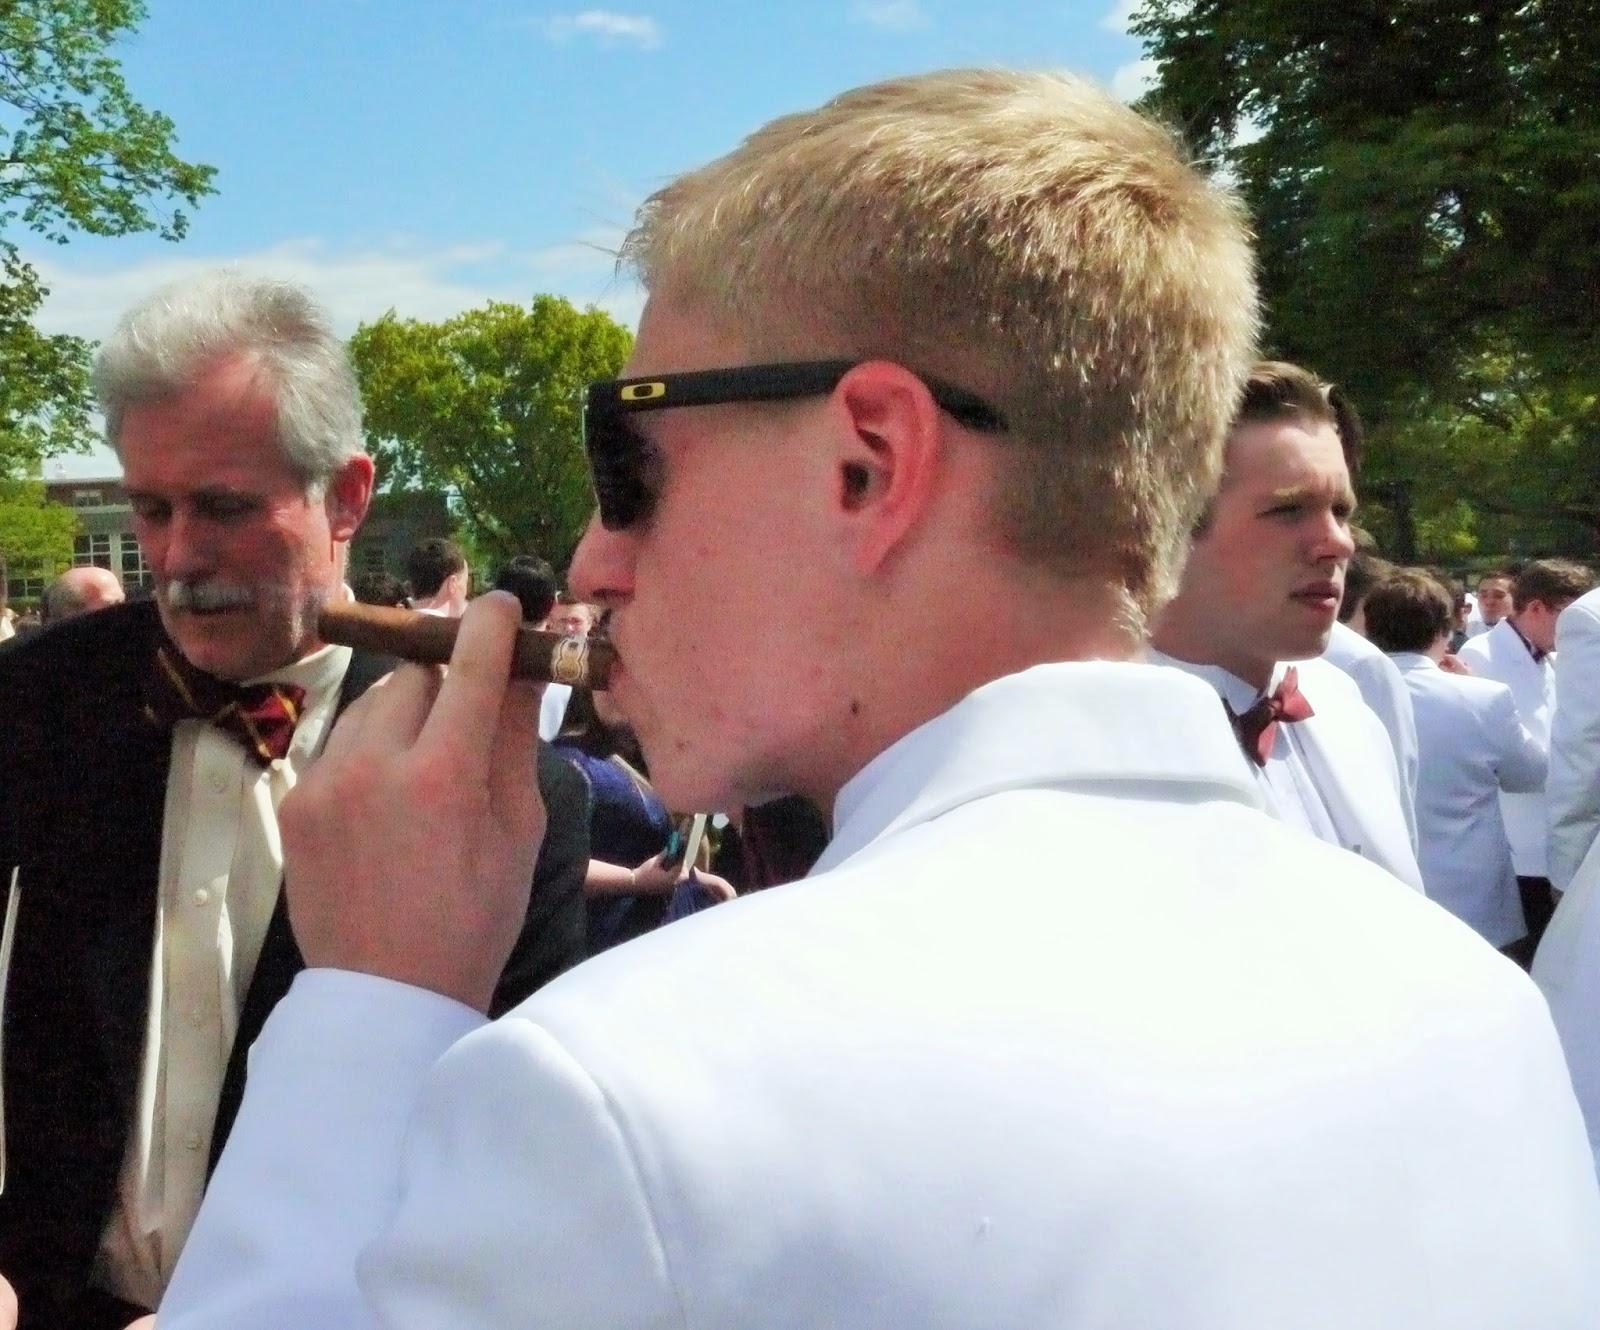 college-students-graduation-cigar-smoking_28.JPG